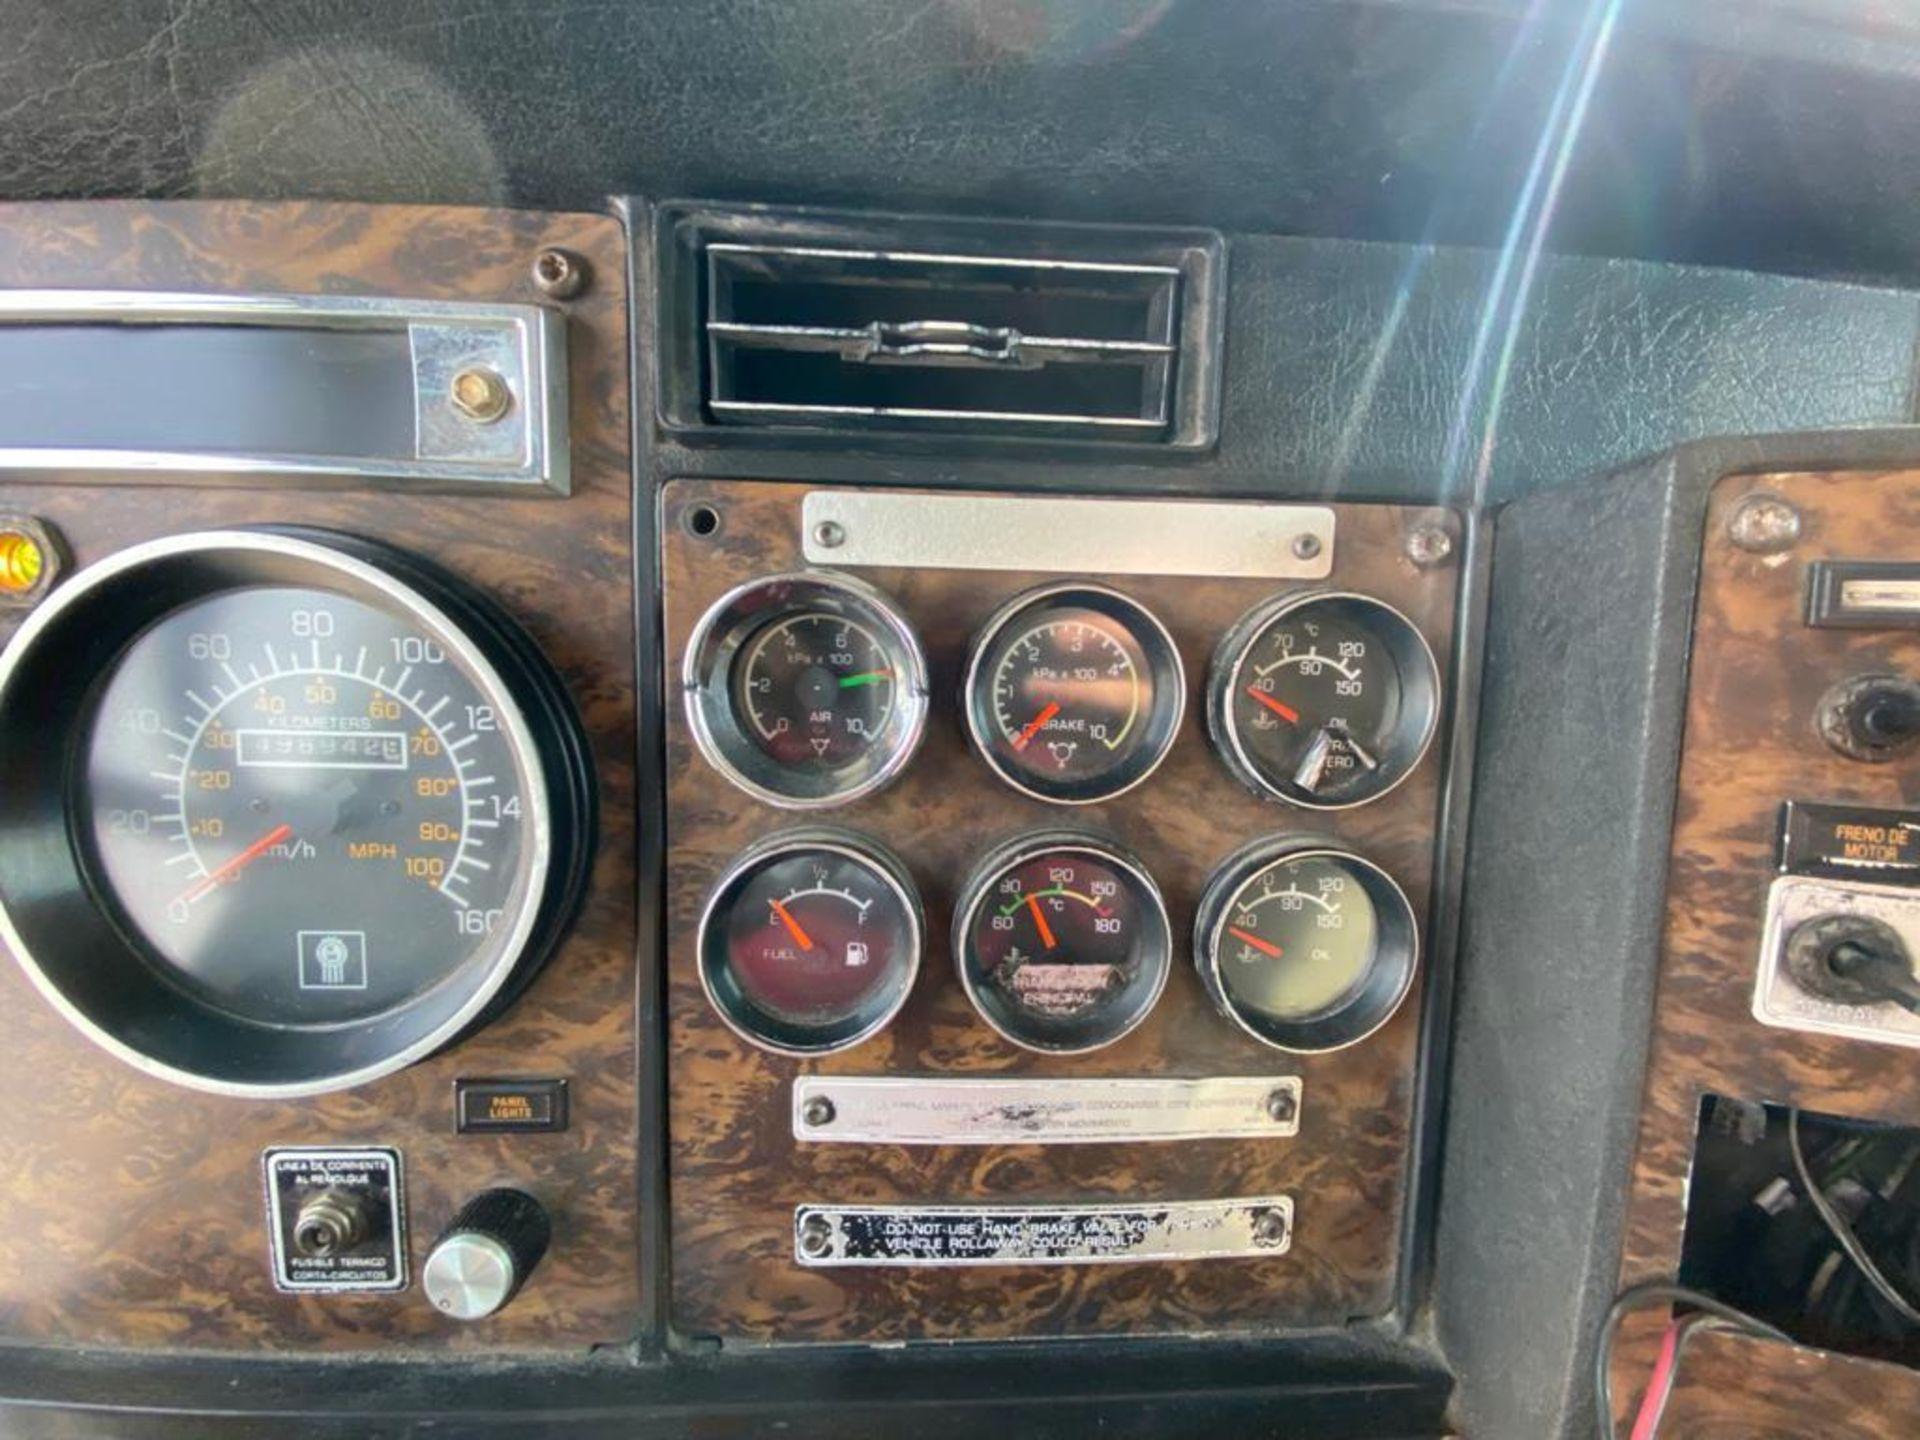 1998 Kenworth Sleeper truck tractor, standard transmission of 18 speeds - Image 36 of 75